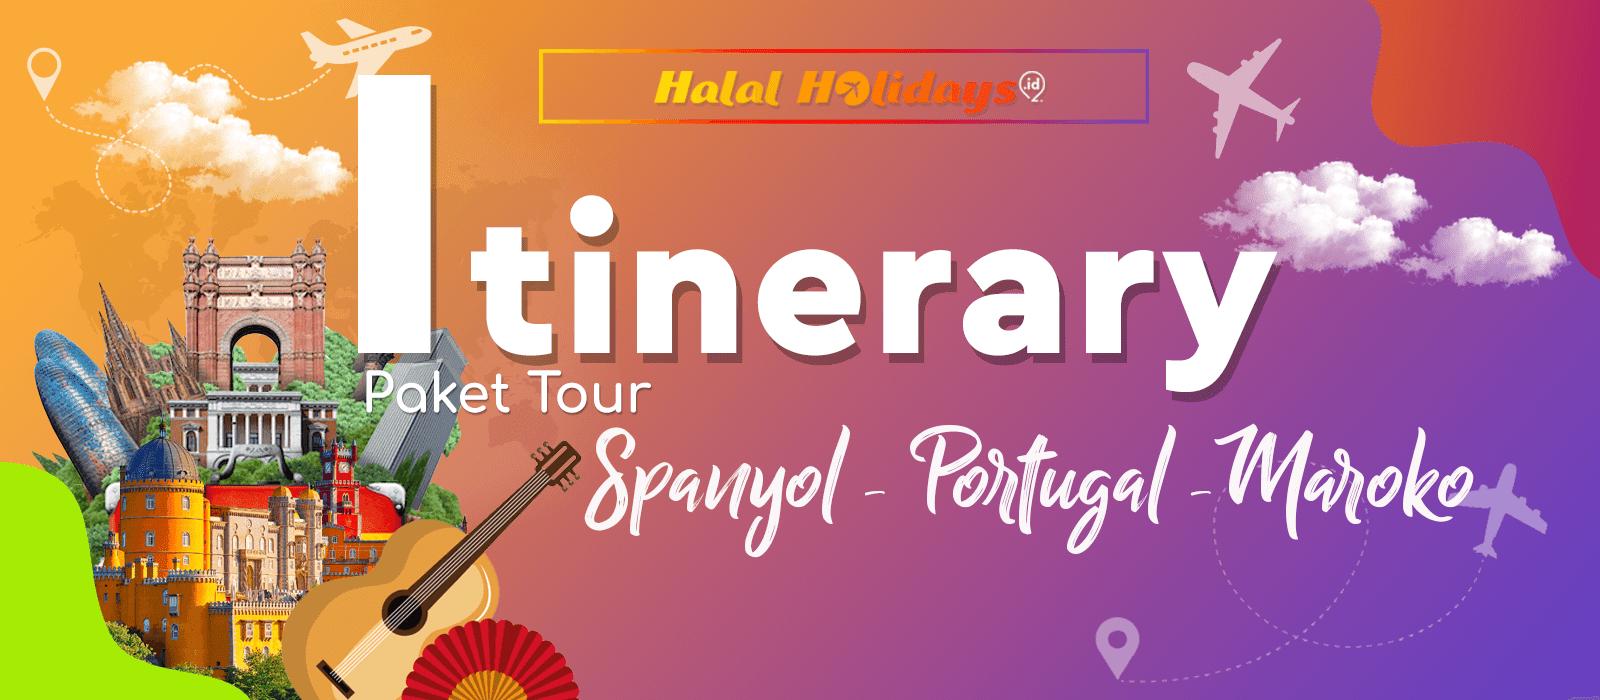 Itinerary Paket Tour Halal Spanyol Portugal Maroko 13 Hari